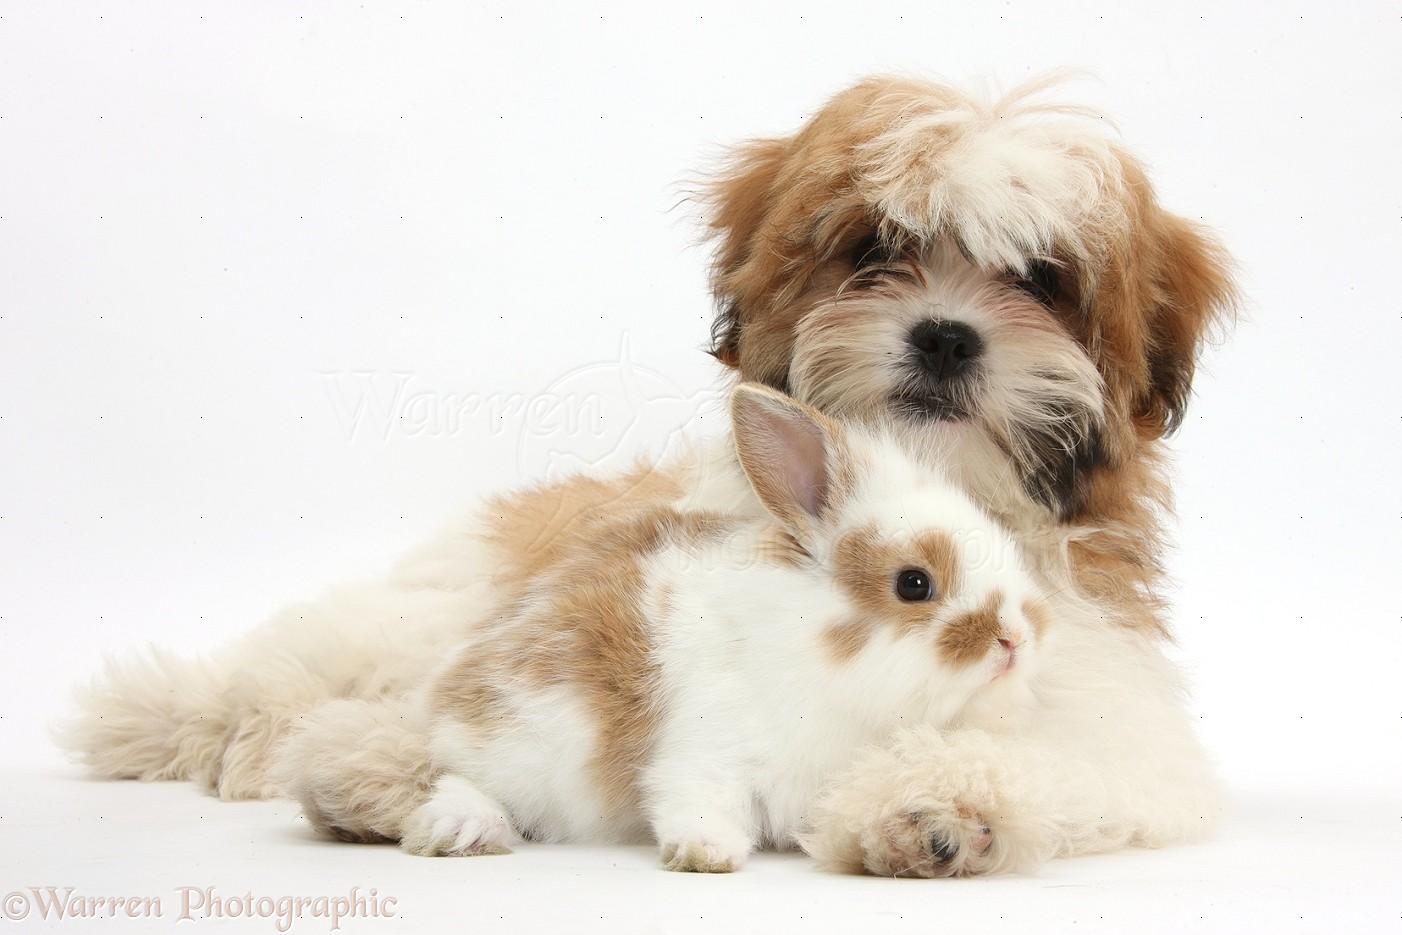 Pets Maltese X Shih Tzu Pup With Rabbit Photo Wp35279